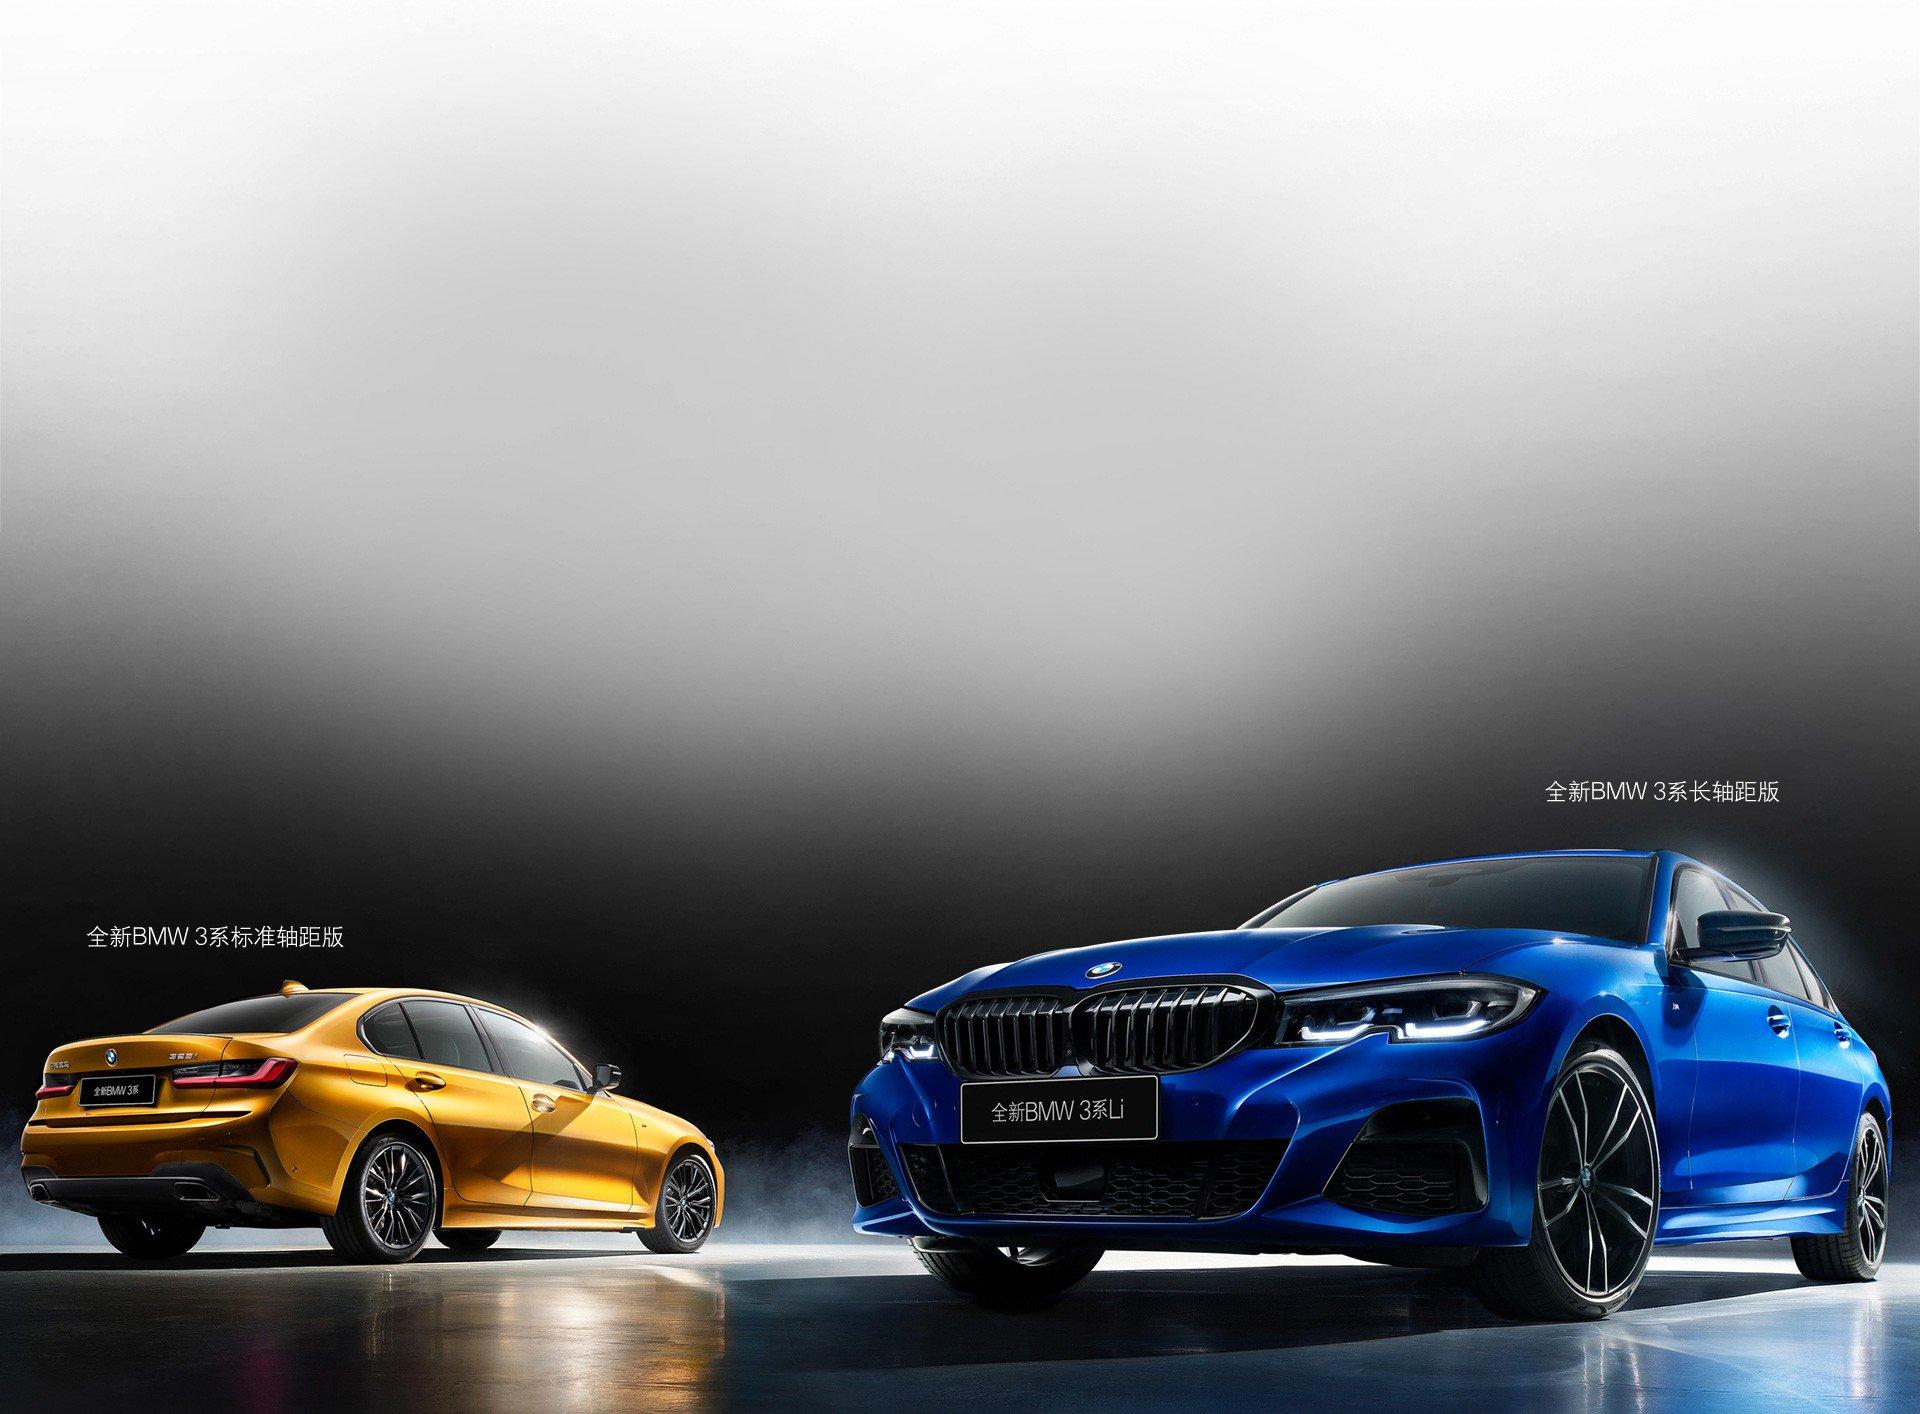 BMW_3-Series_Li_0009